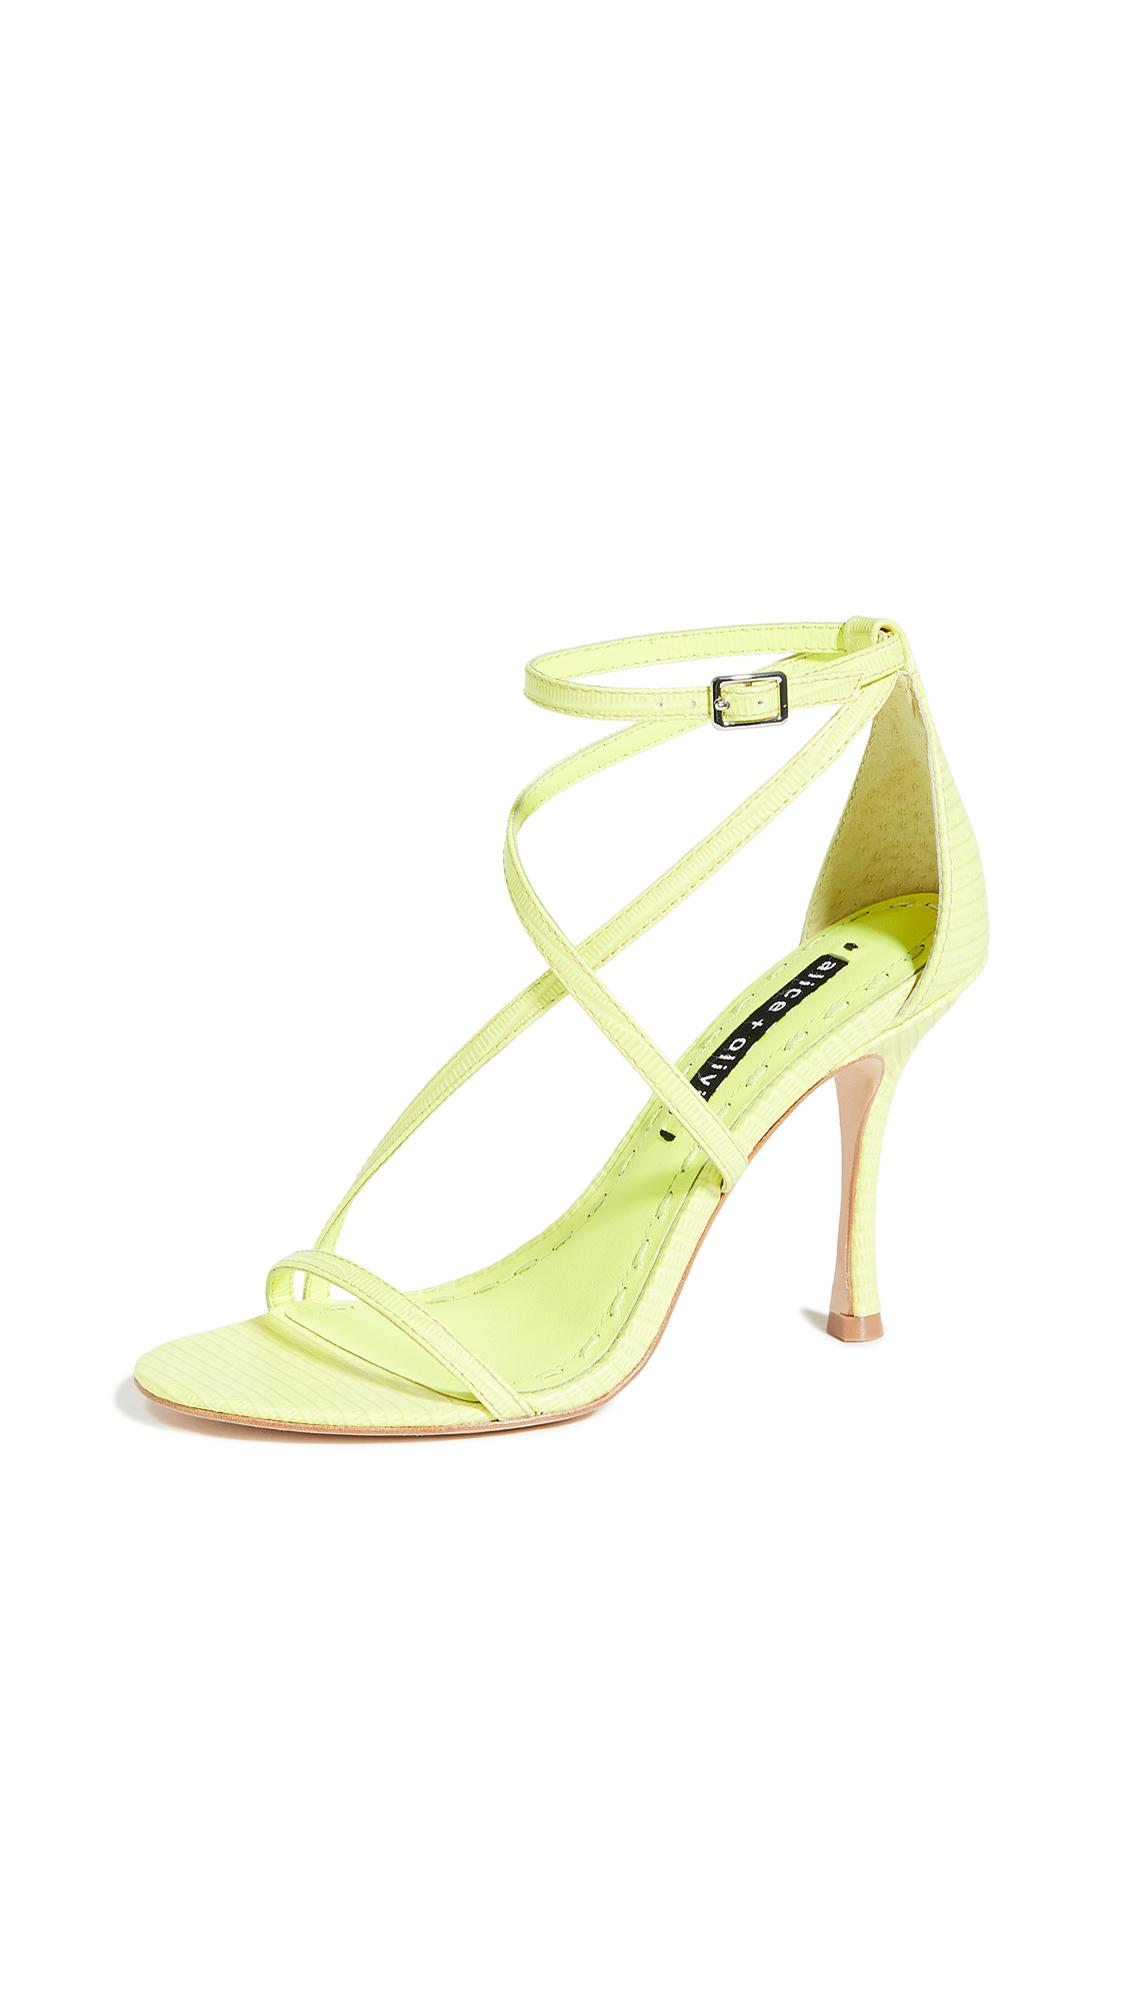 alice + olivia Deidra Sandals